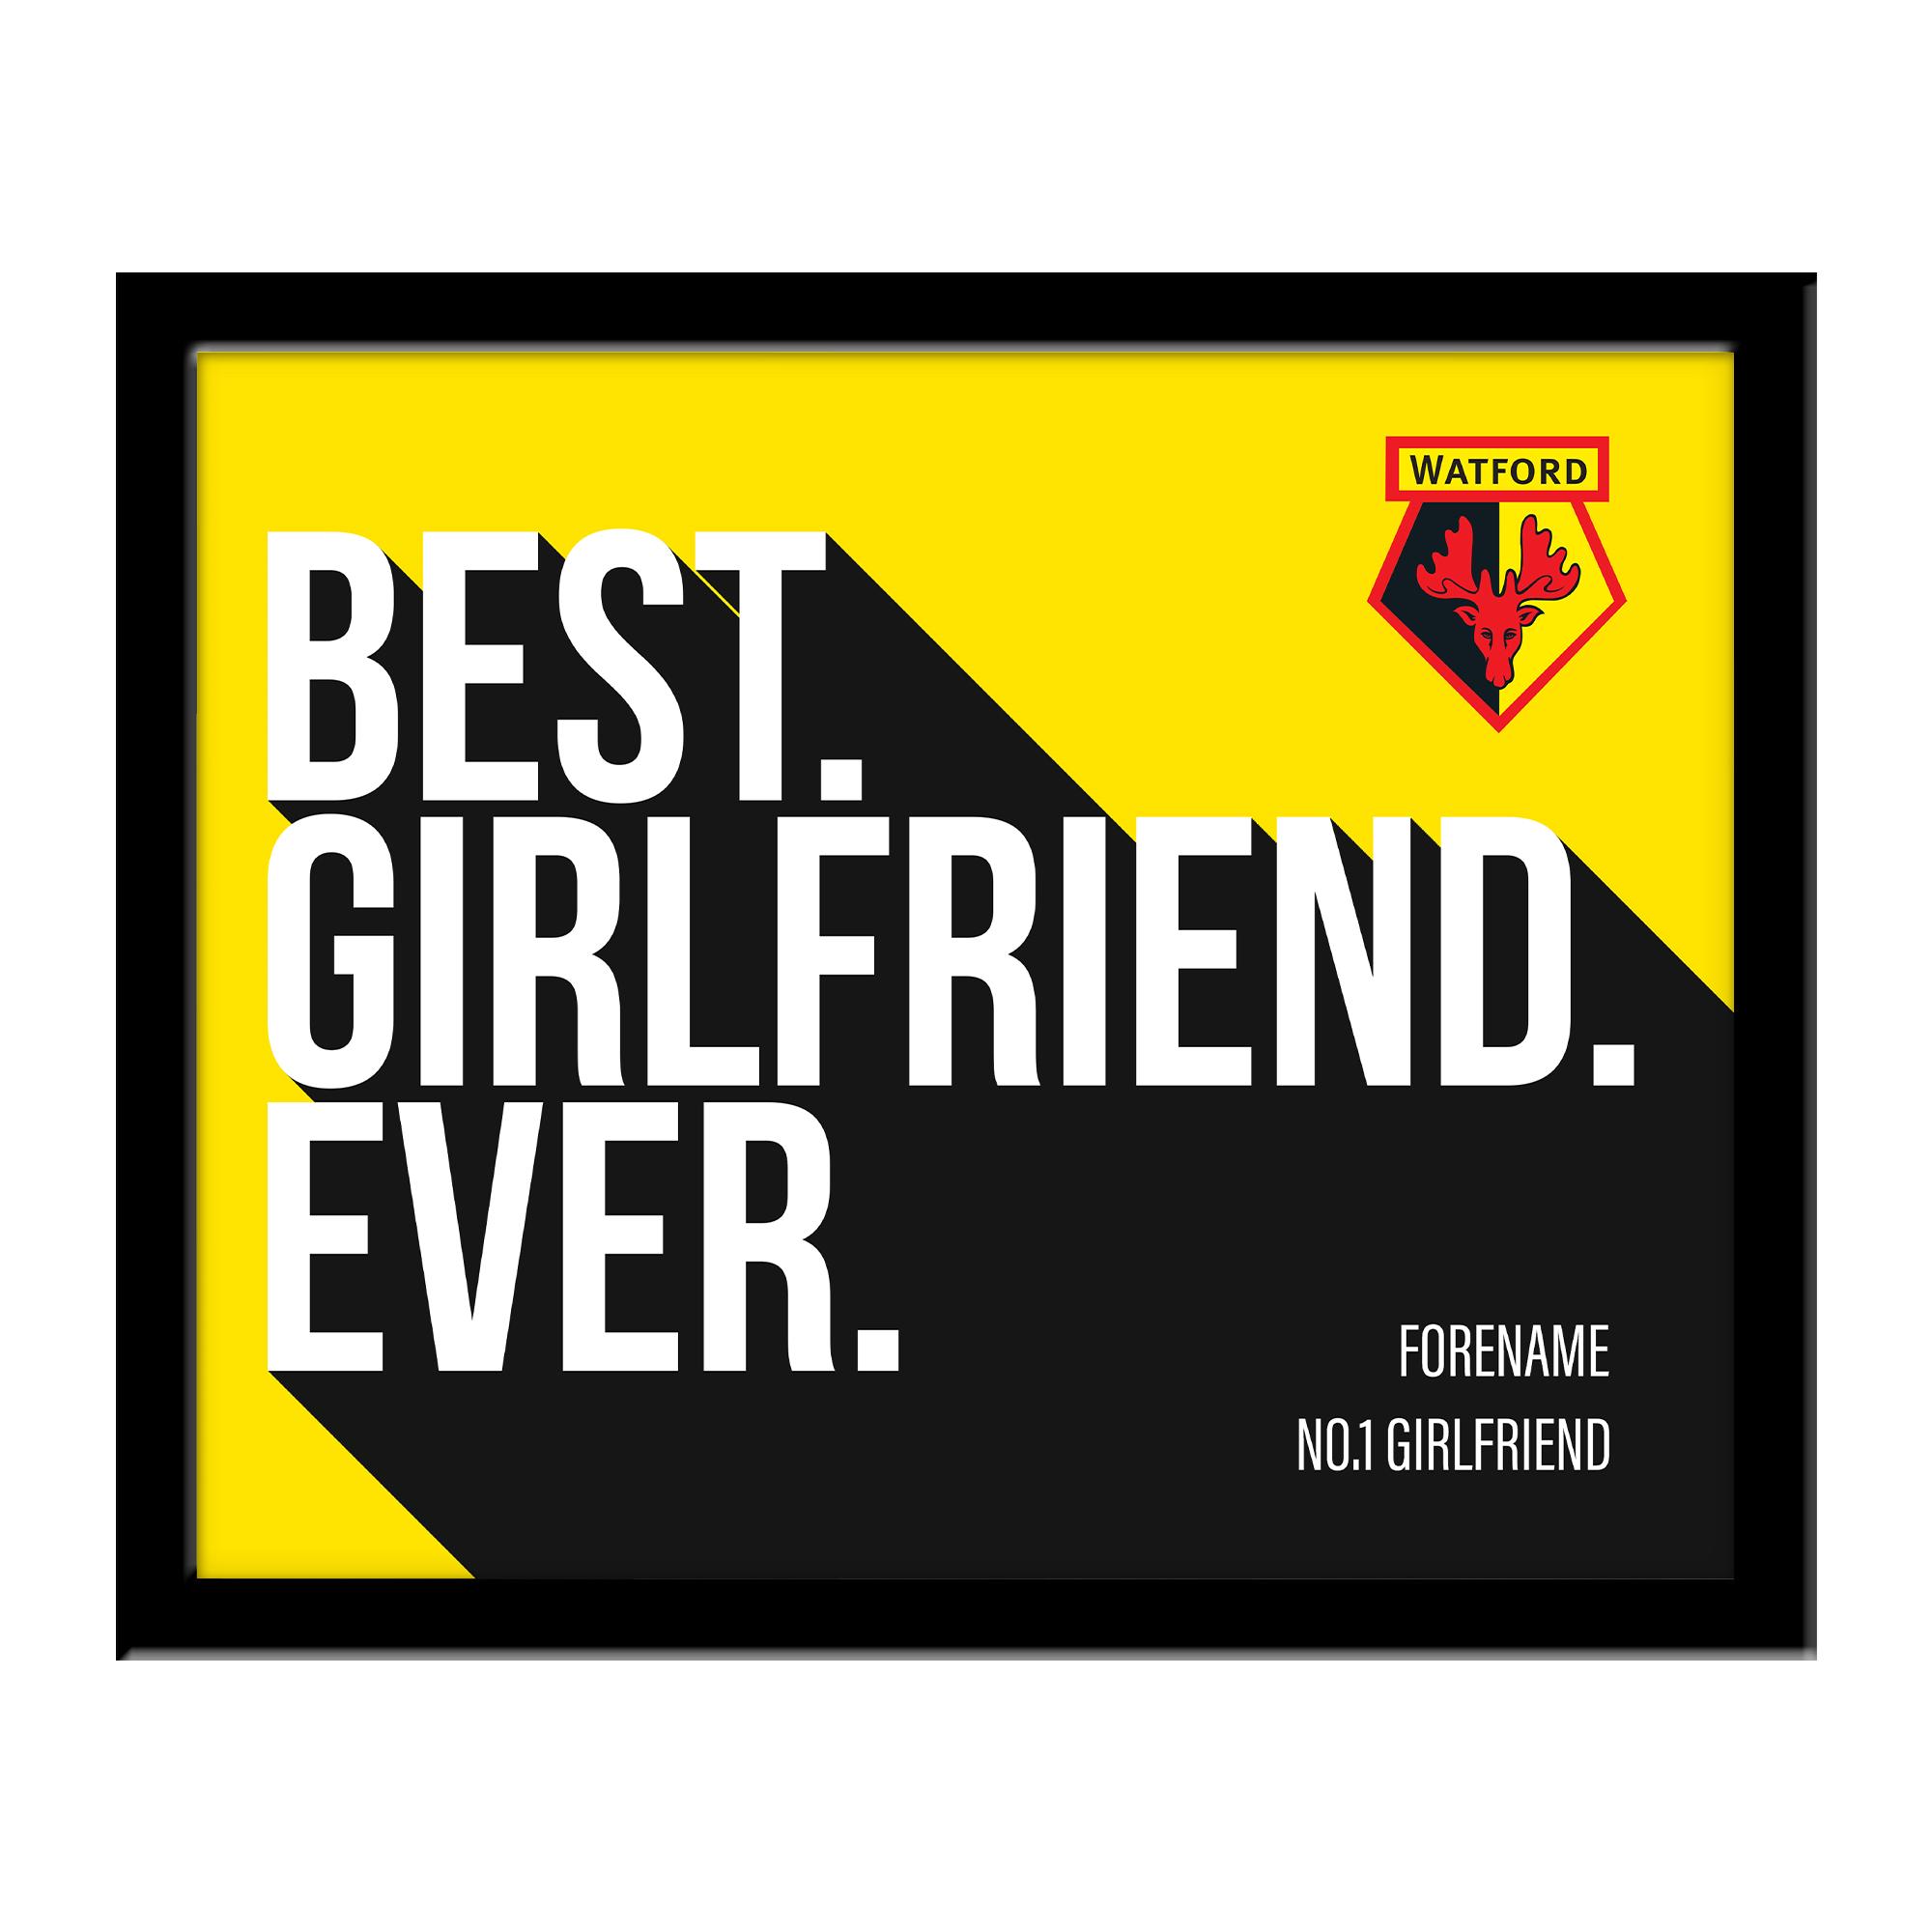 Watford FC Best Girlfriend Ever 10 x 8 Photo Framed